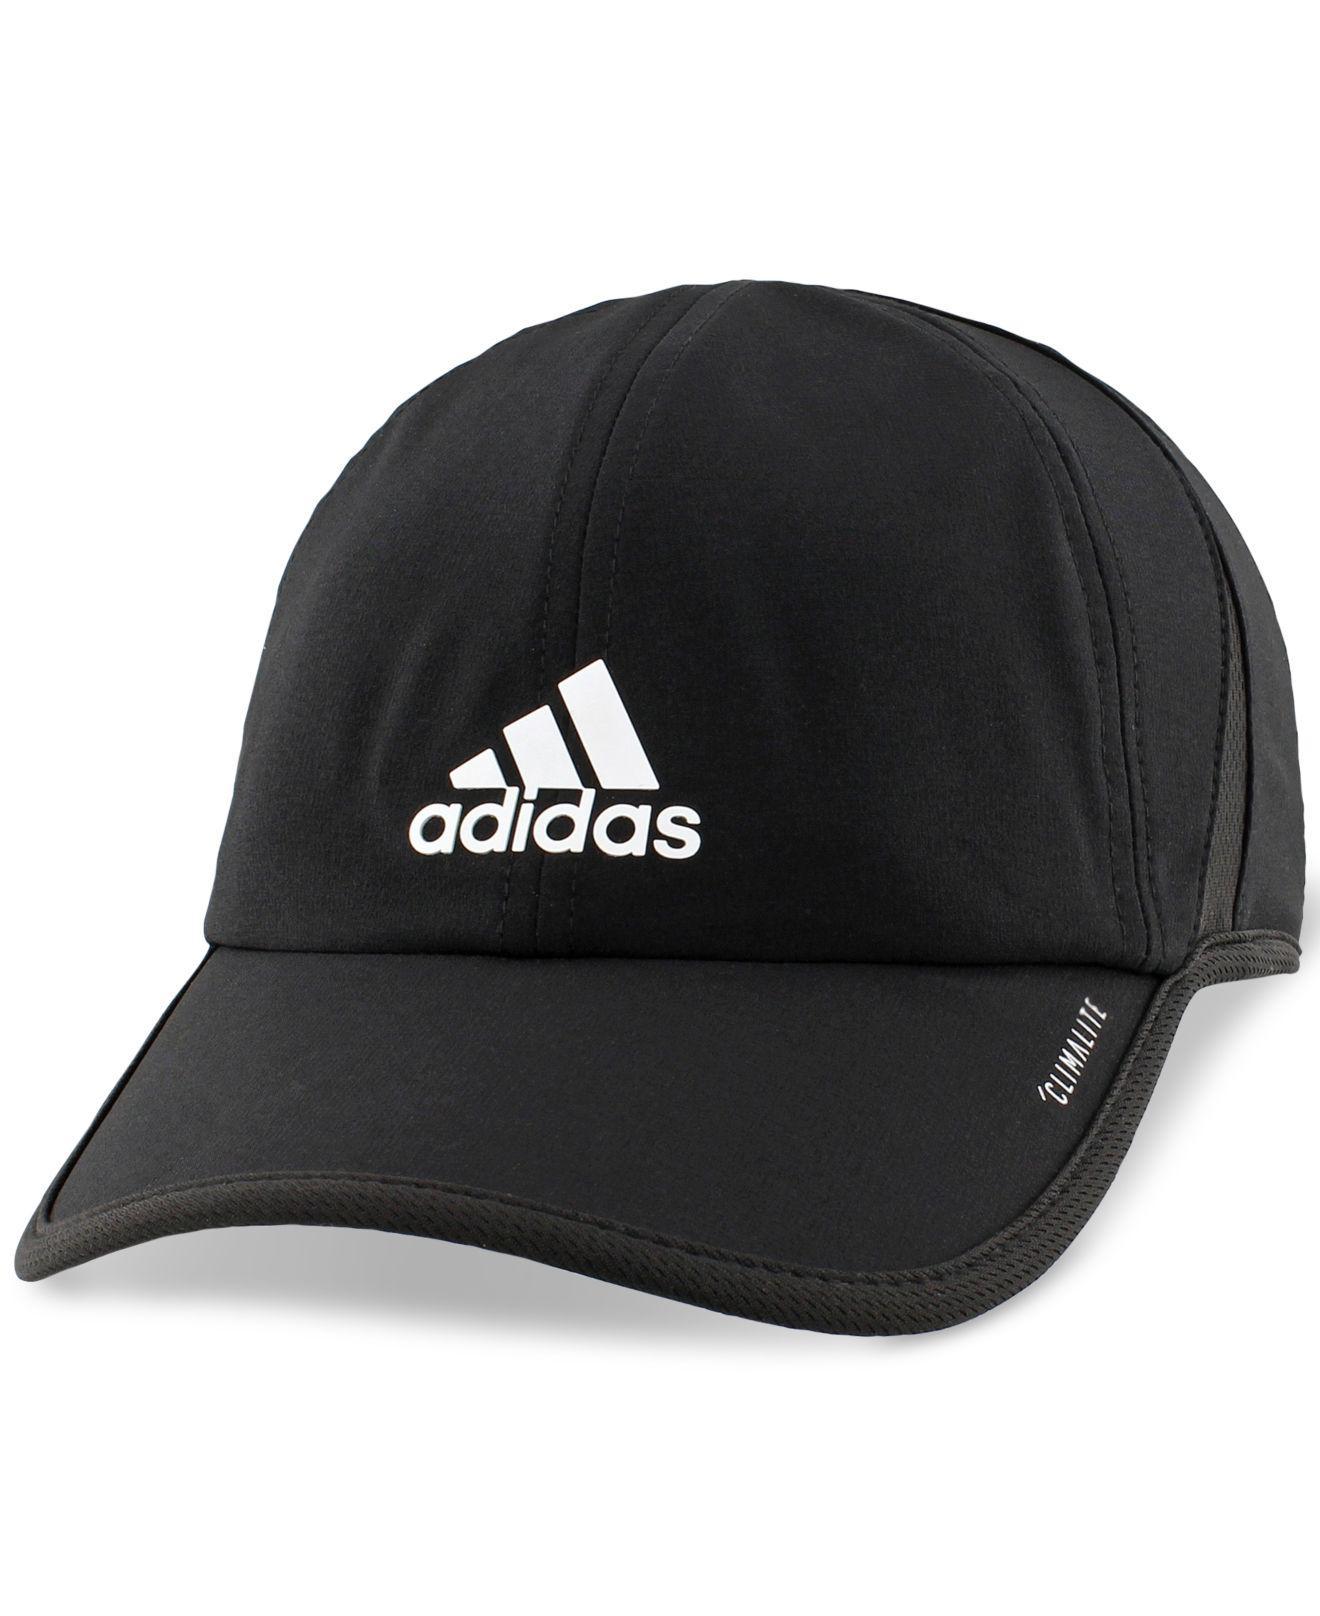 e9a88c5af8e Lyst - adidas Superlite Climalite® Cap in Black for Men